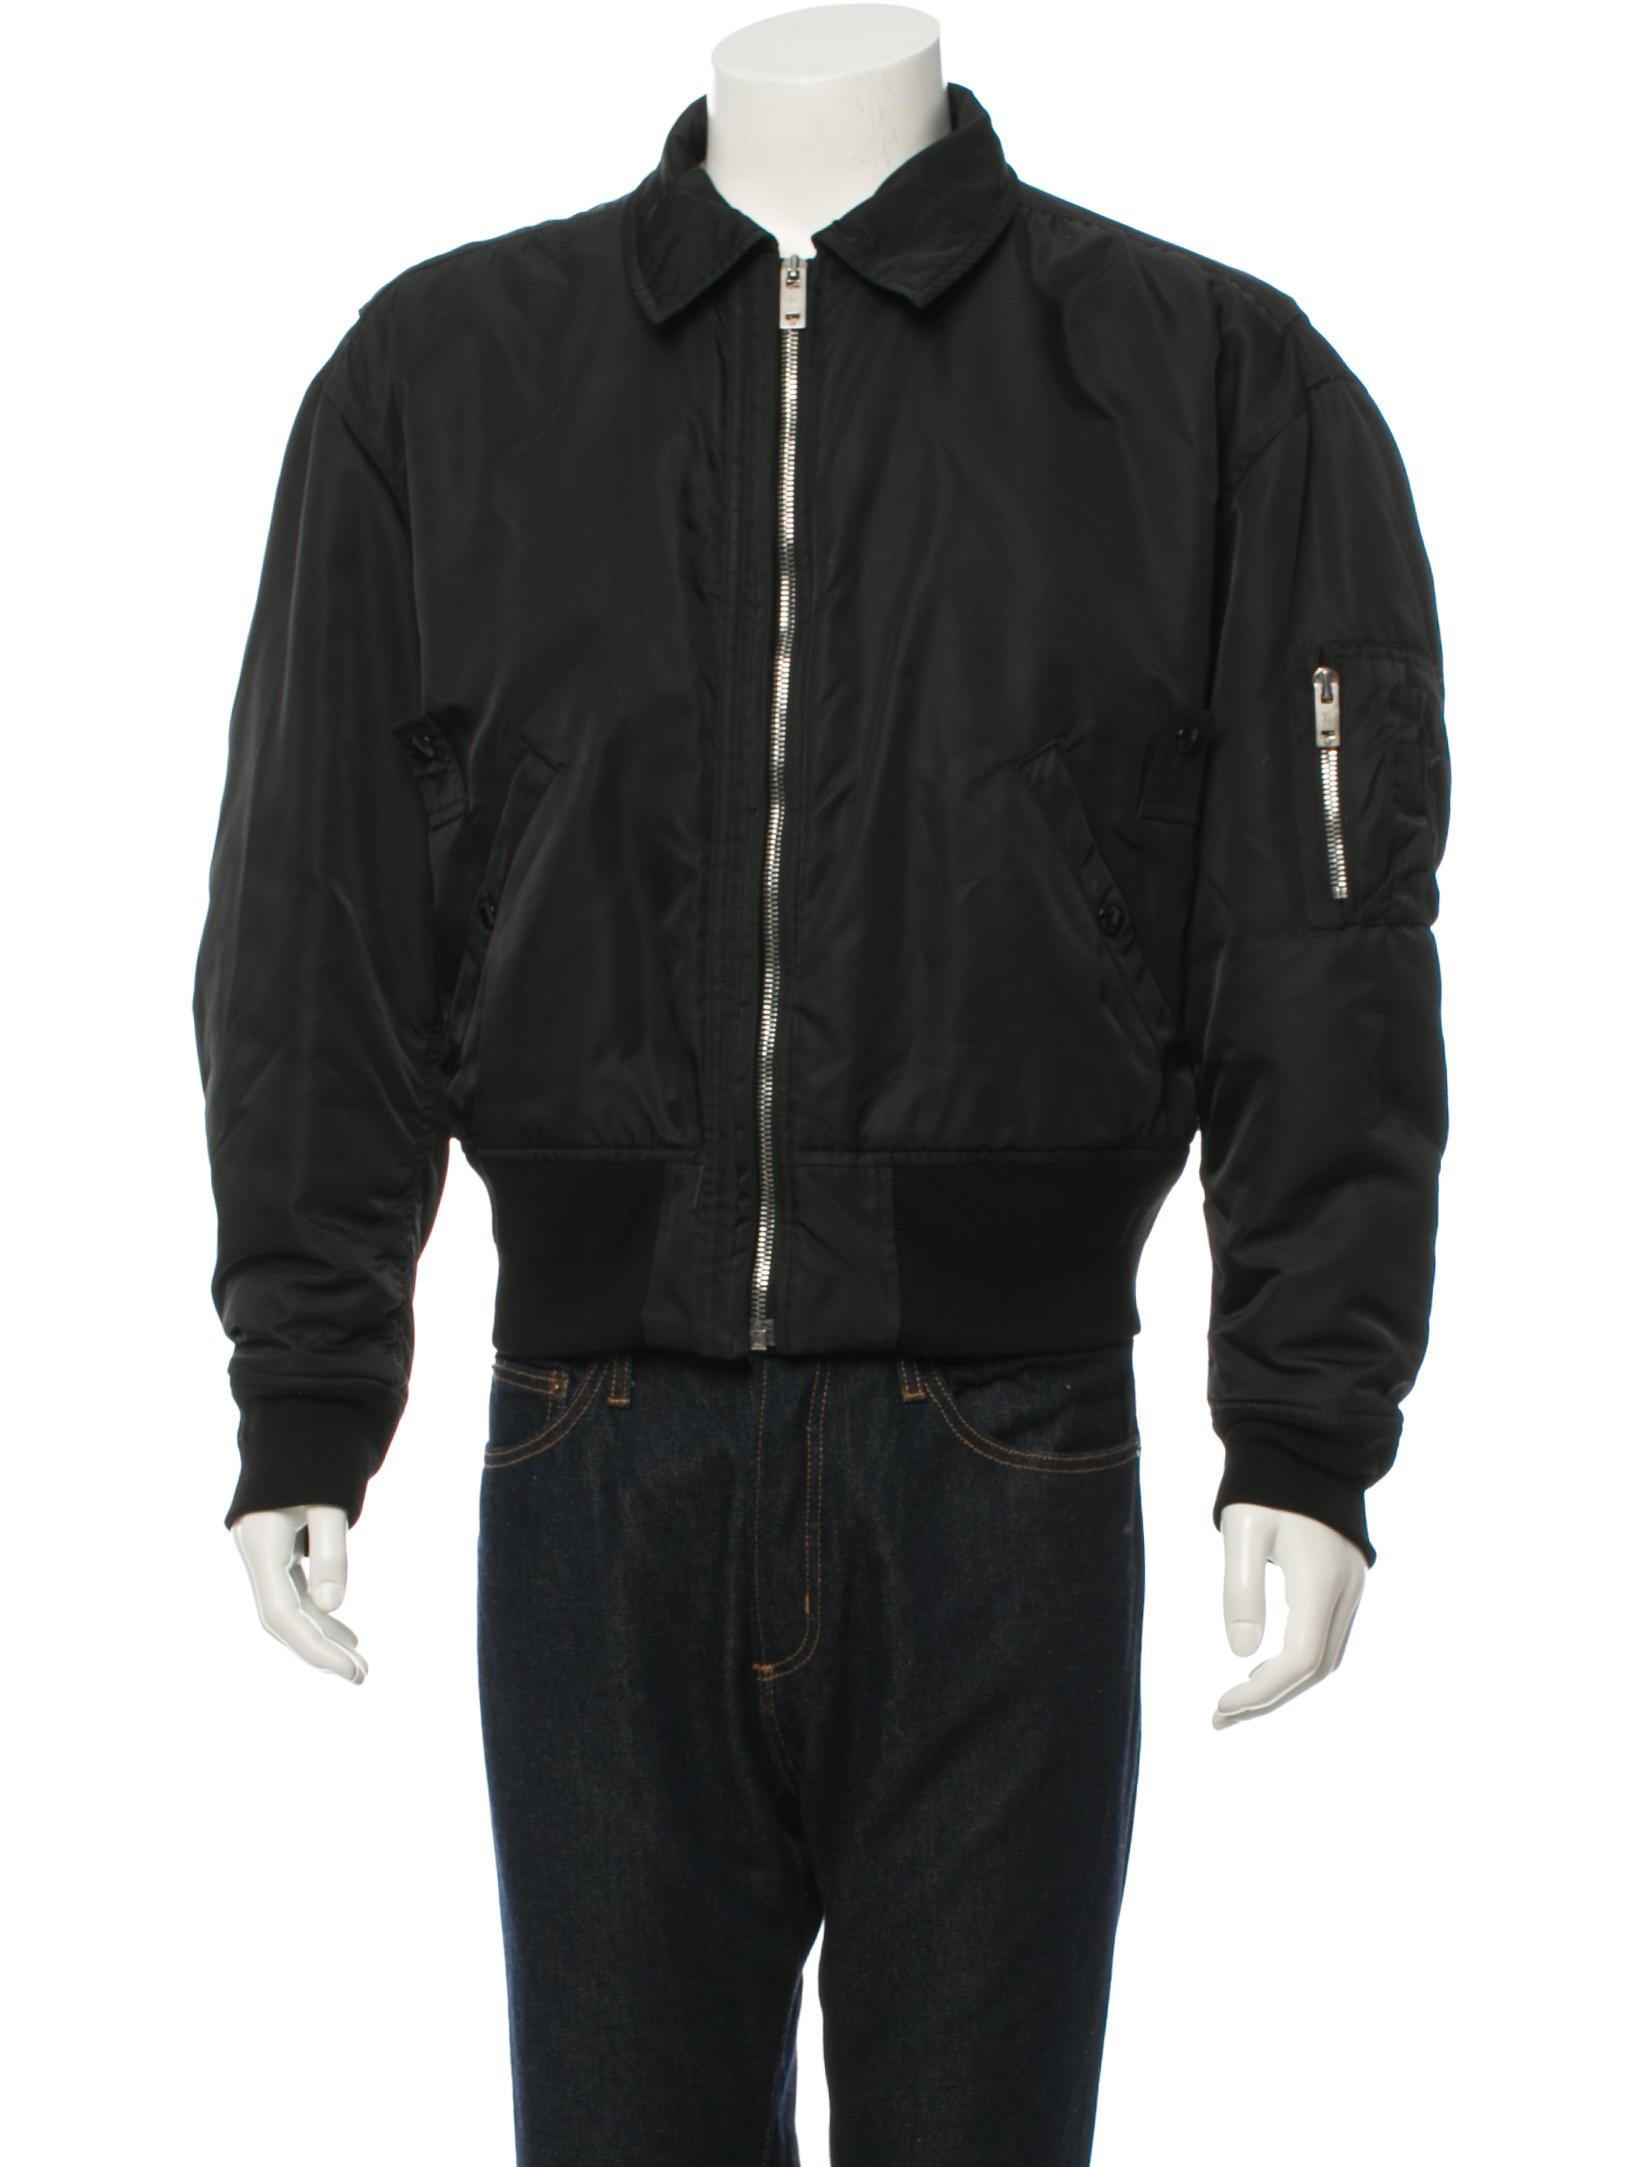 louis vuitton bomber jacket mens outerwear lou47466. Black Bedroom Furniture Sets. Home Design Ideas